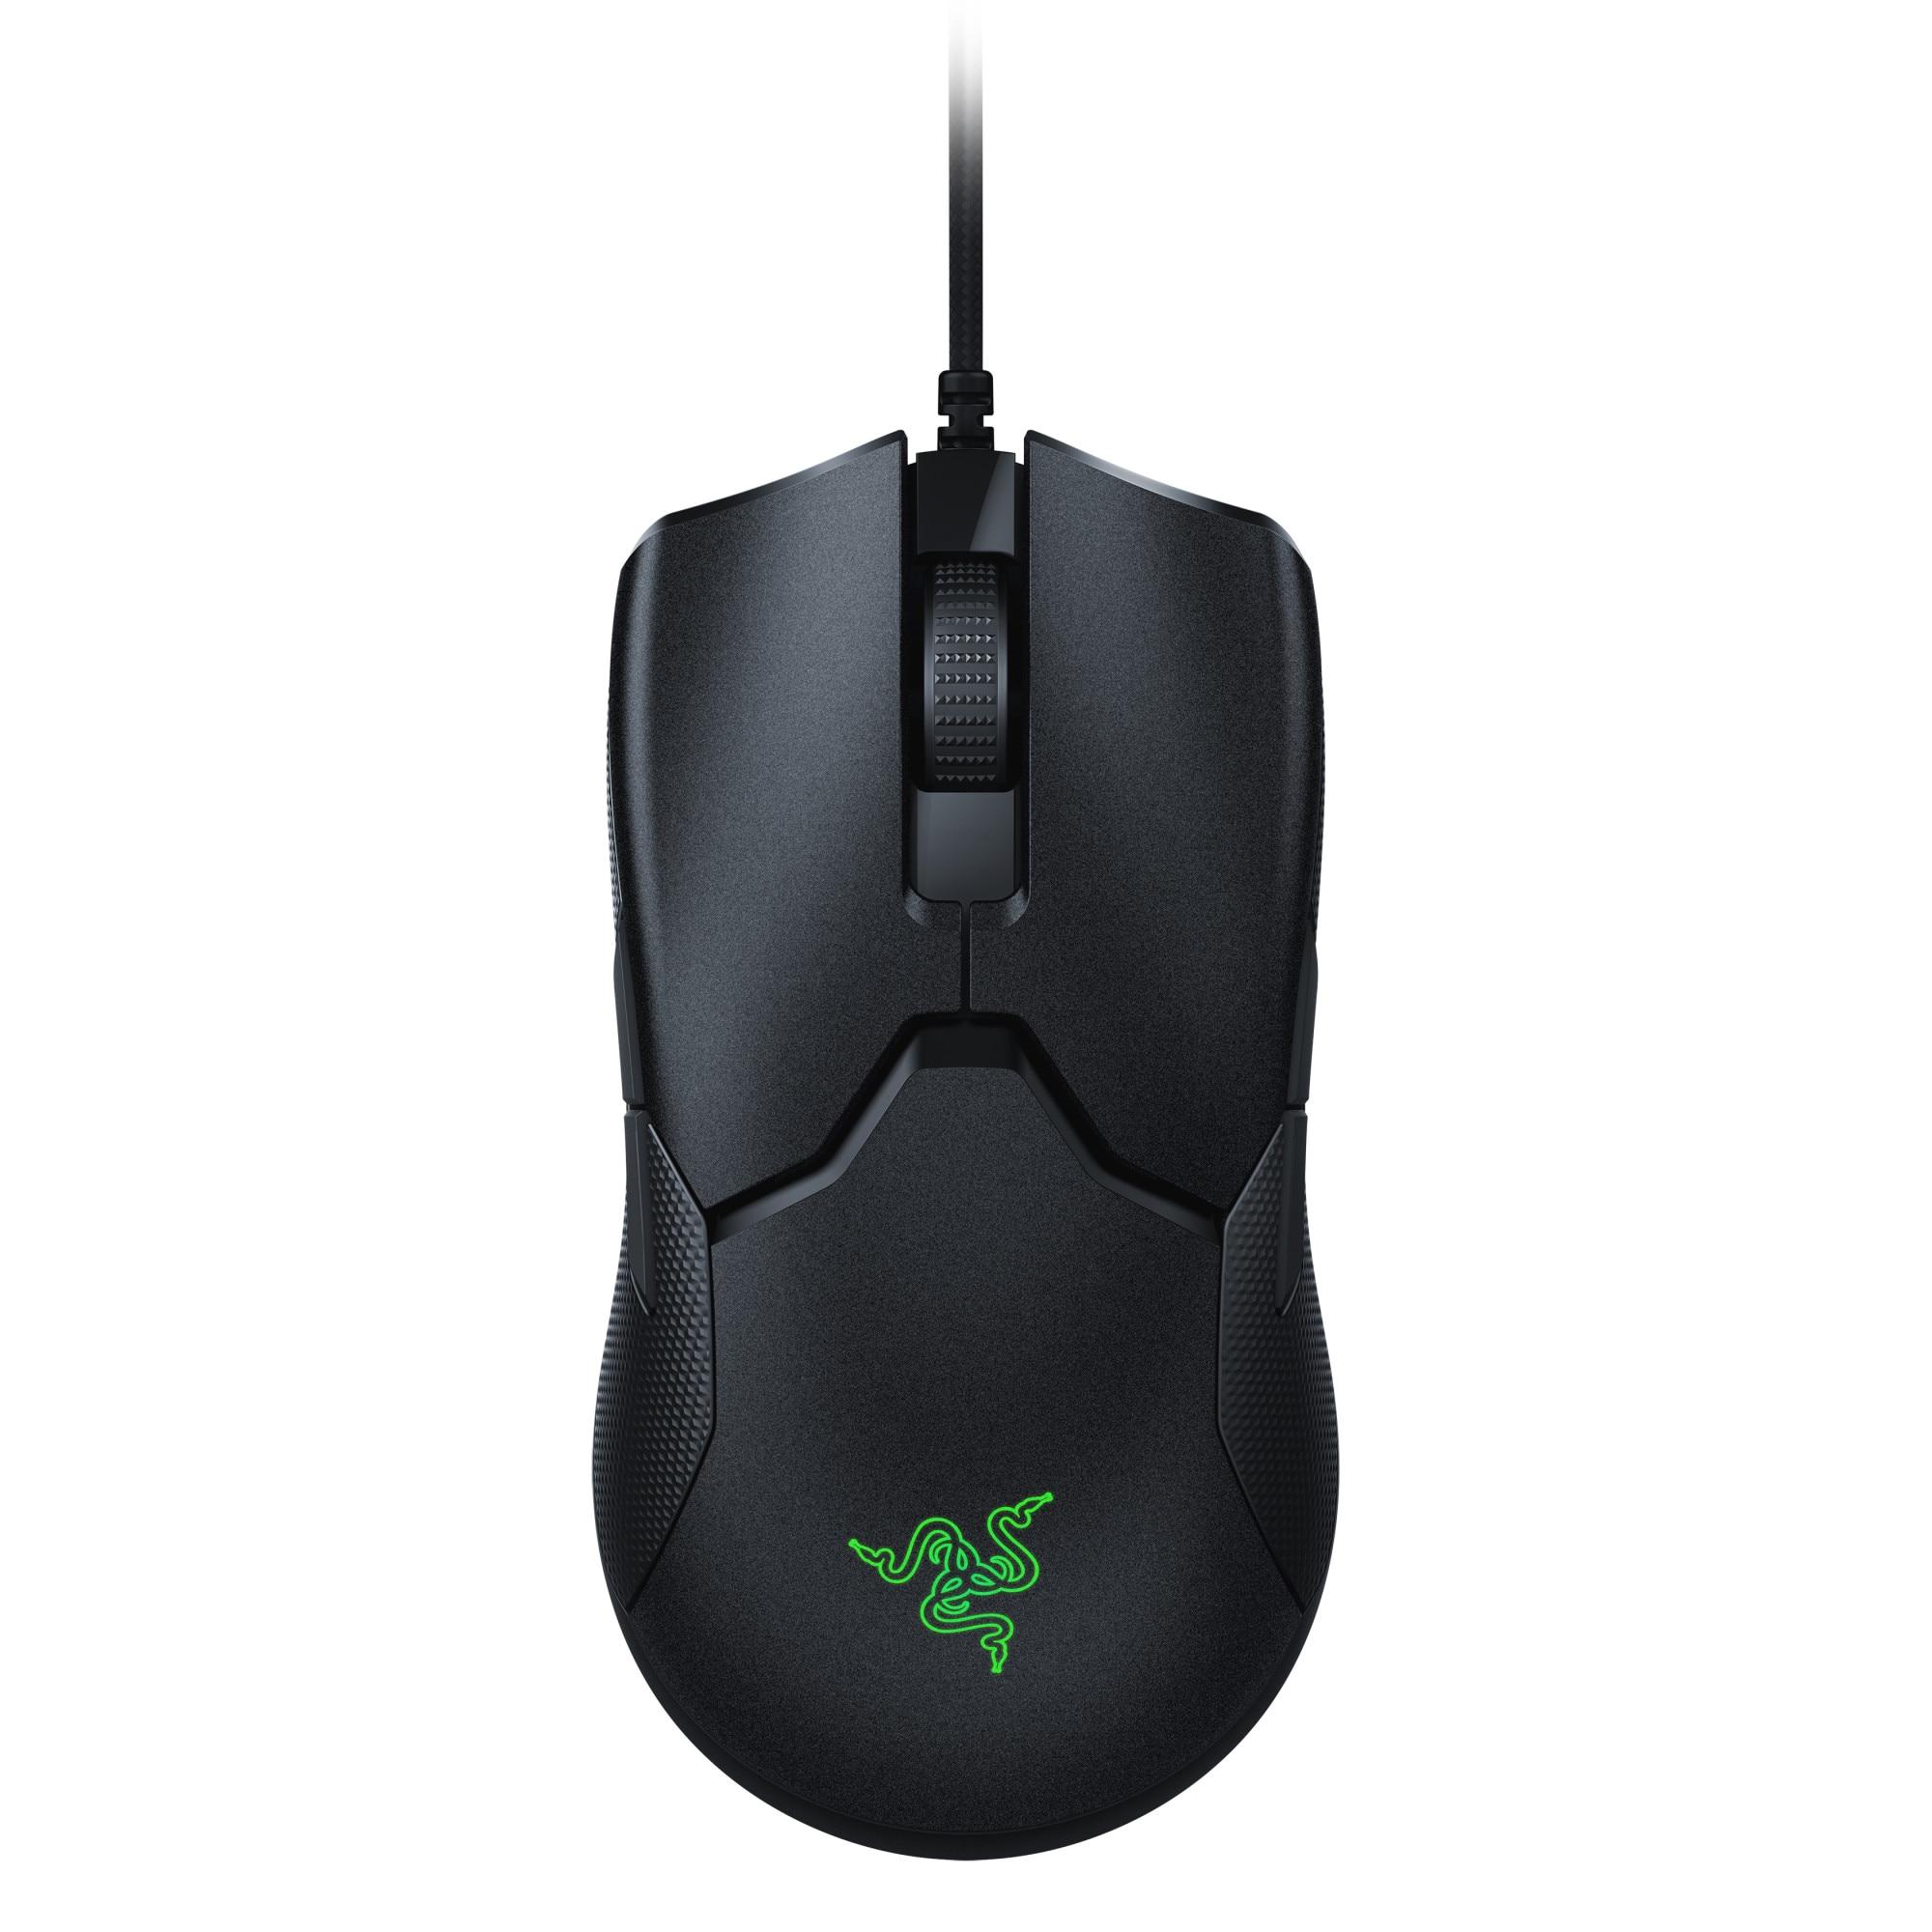 Fotografie Mouse gaming Razer Viper, Ultrausor 69g, cablu SpeedFlex, iluminare Chroma RGB, Negru